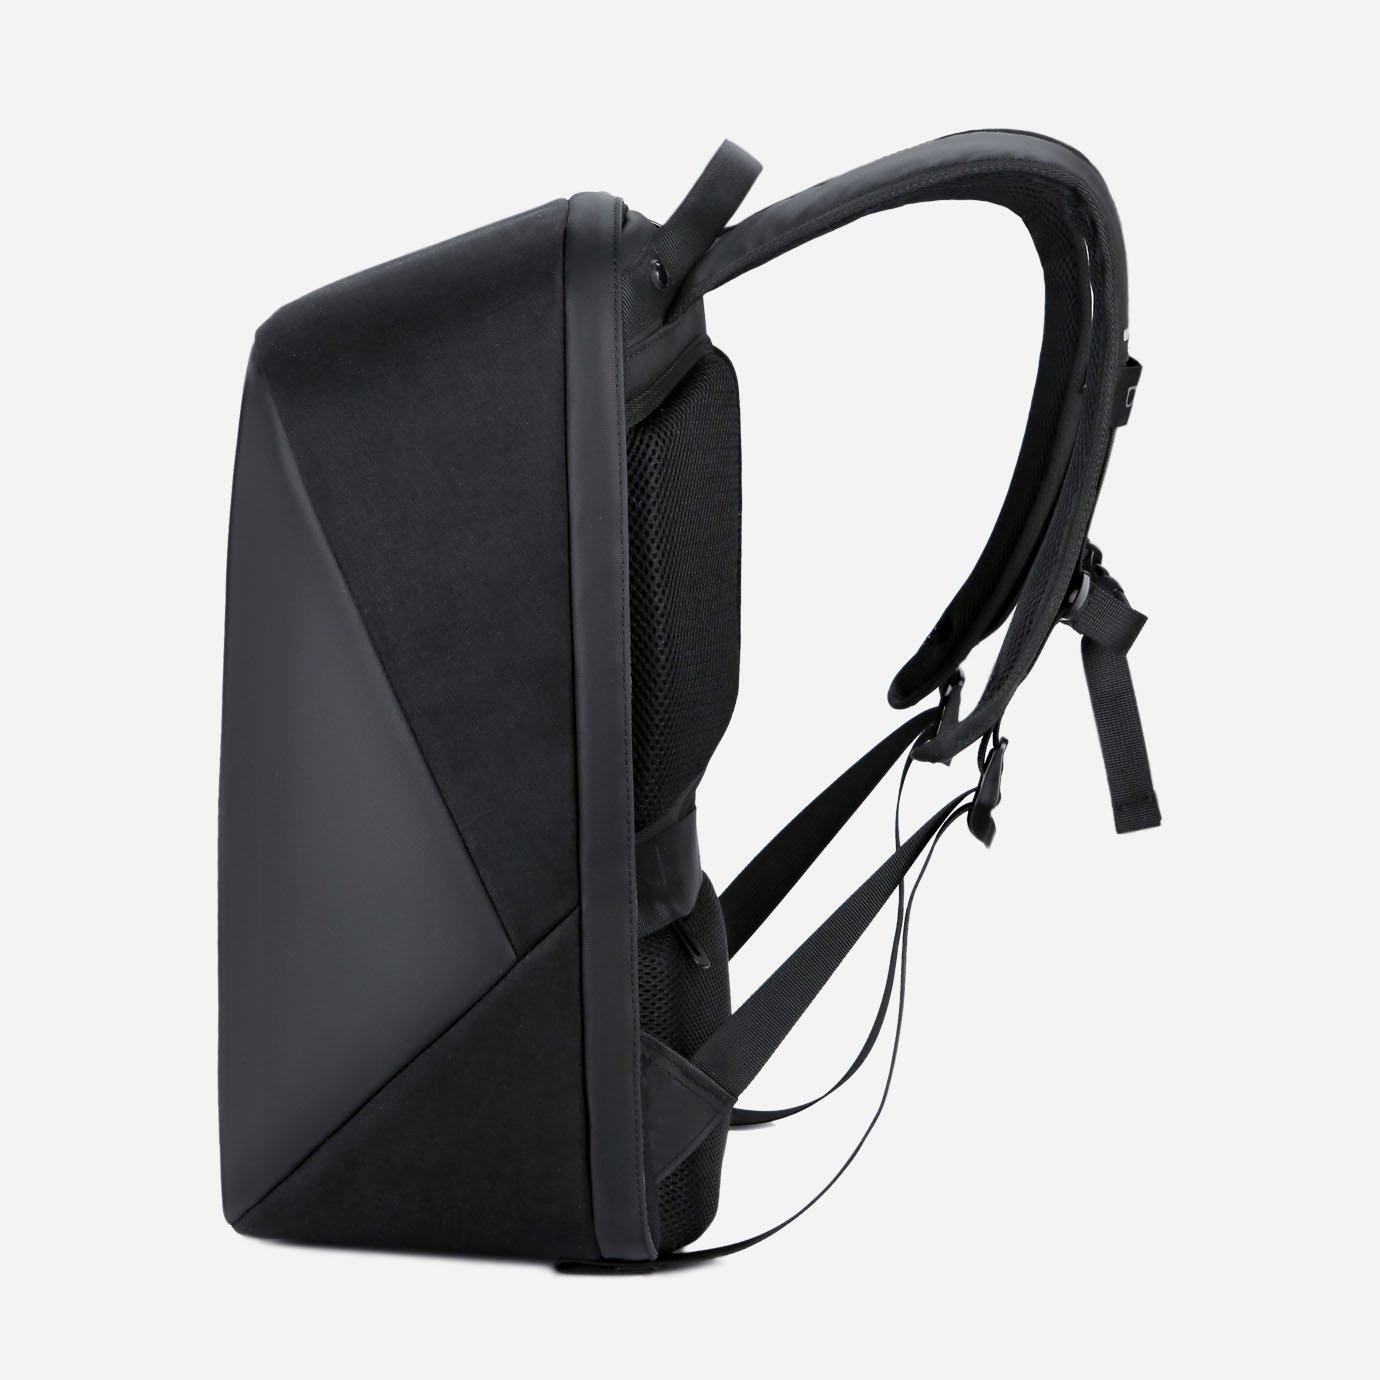 Nordace Windsor - Modern Anti-Theft Smart Backpack